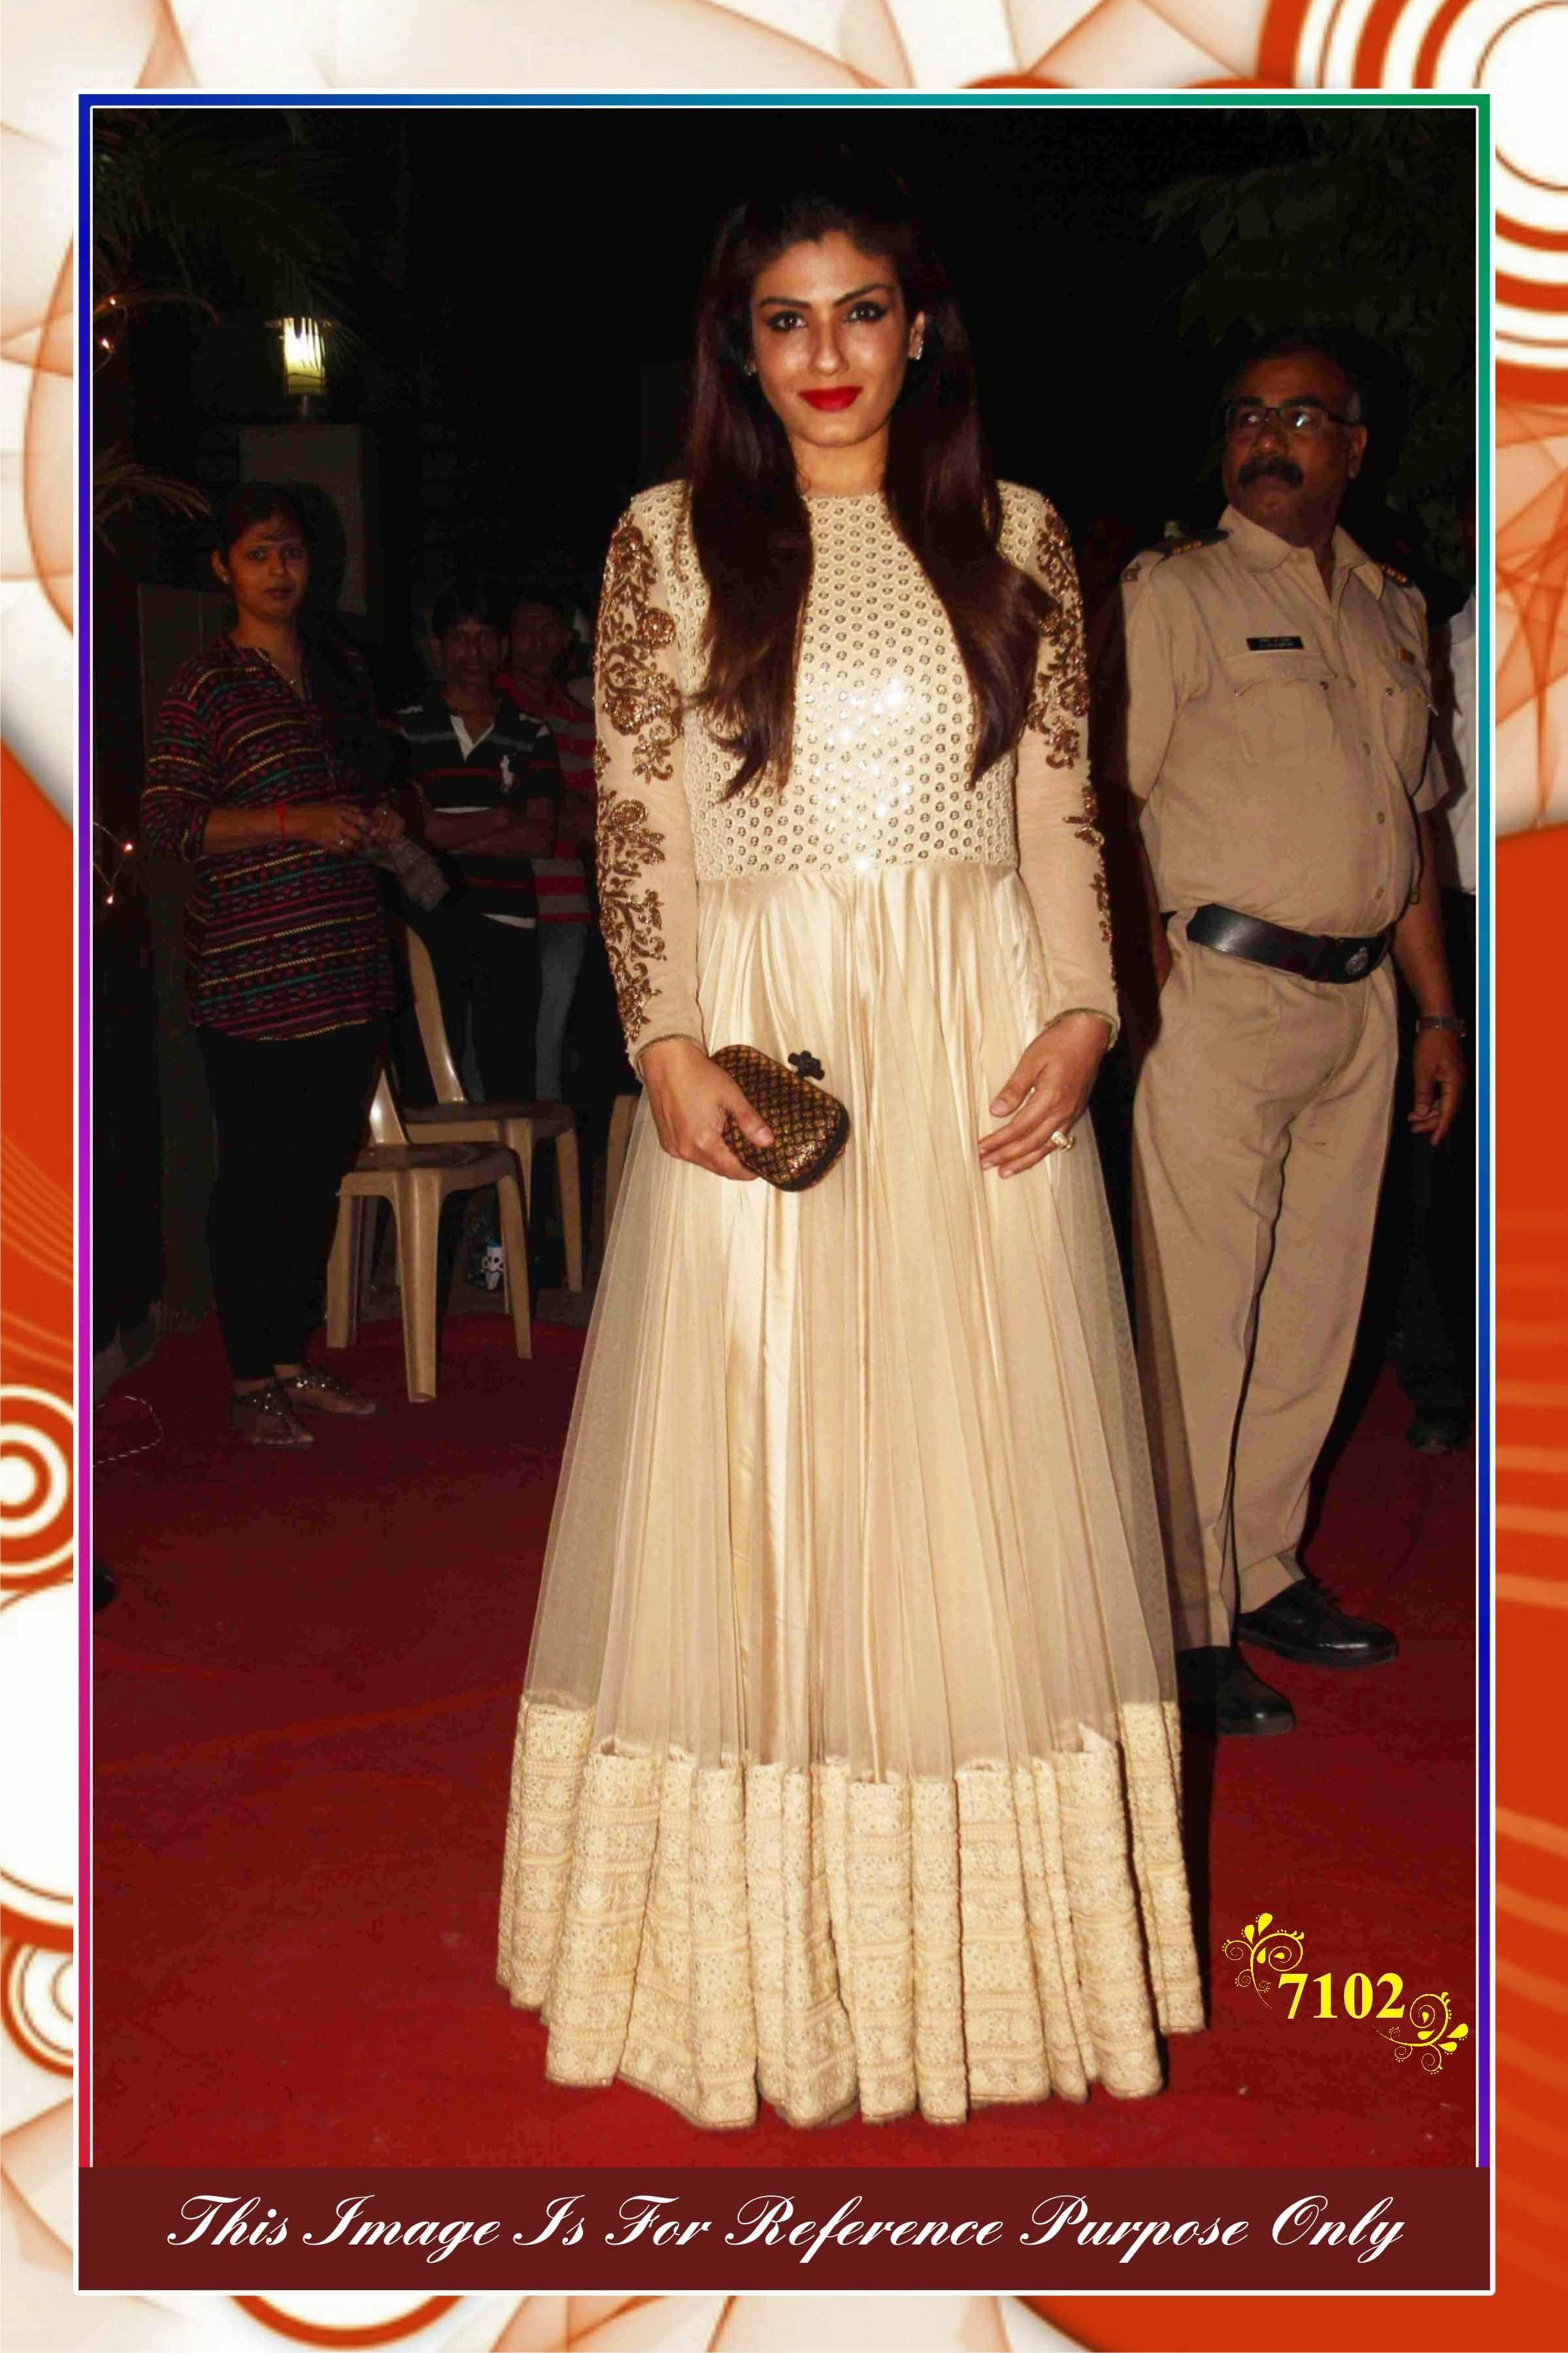 ae7a73f86c Bollywood Replica Dress in cream colour-7102 - Online Shopping Marketplace  Shopdrill.com